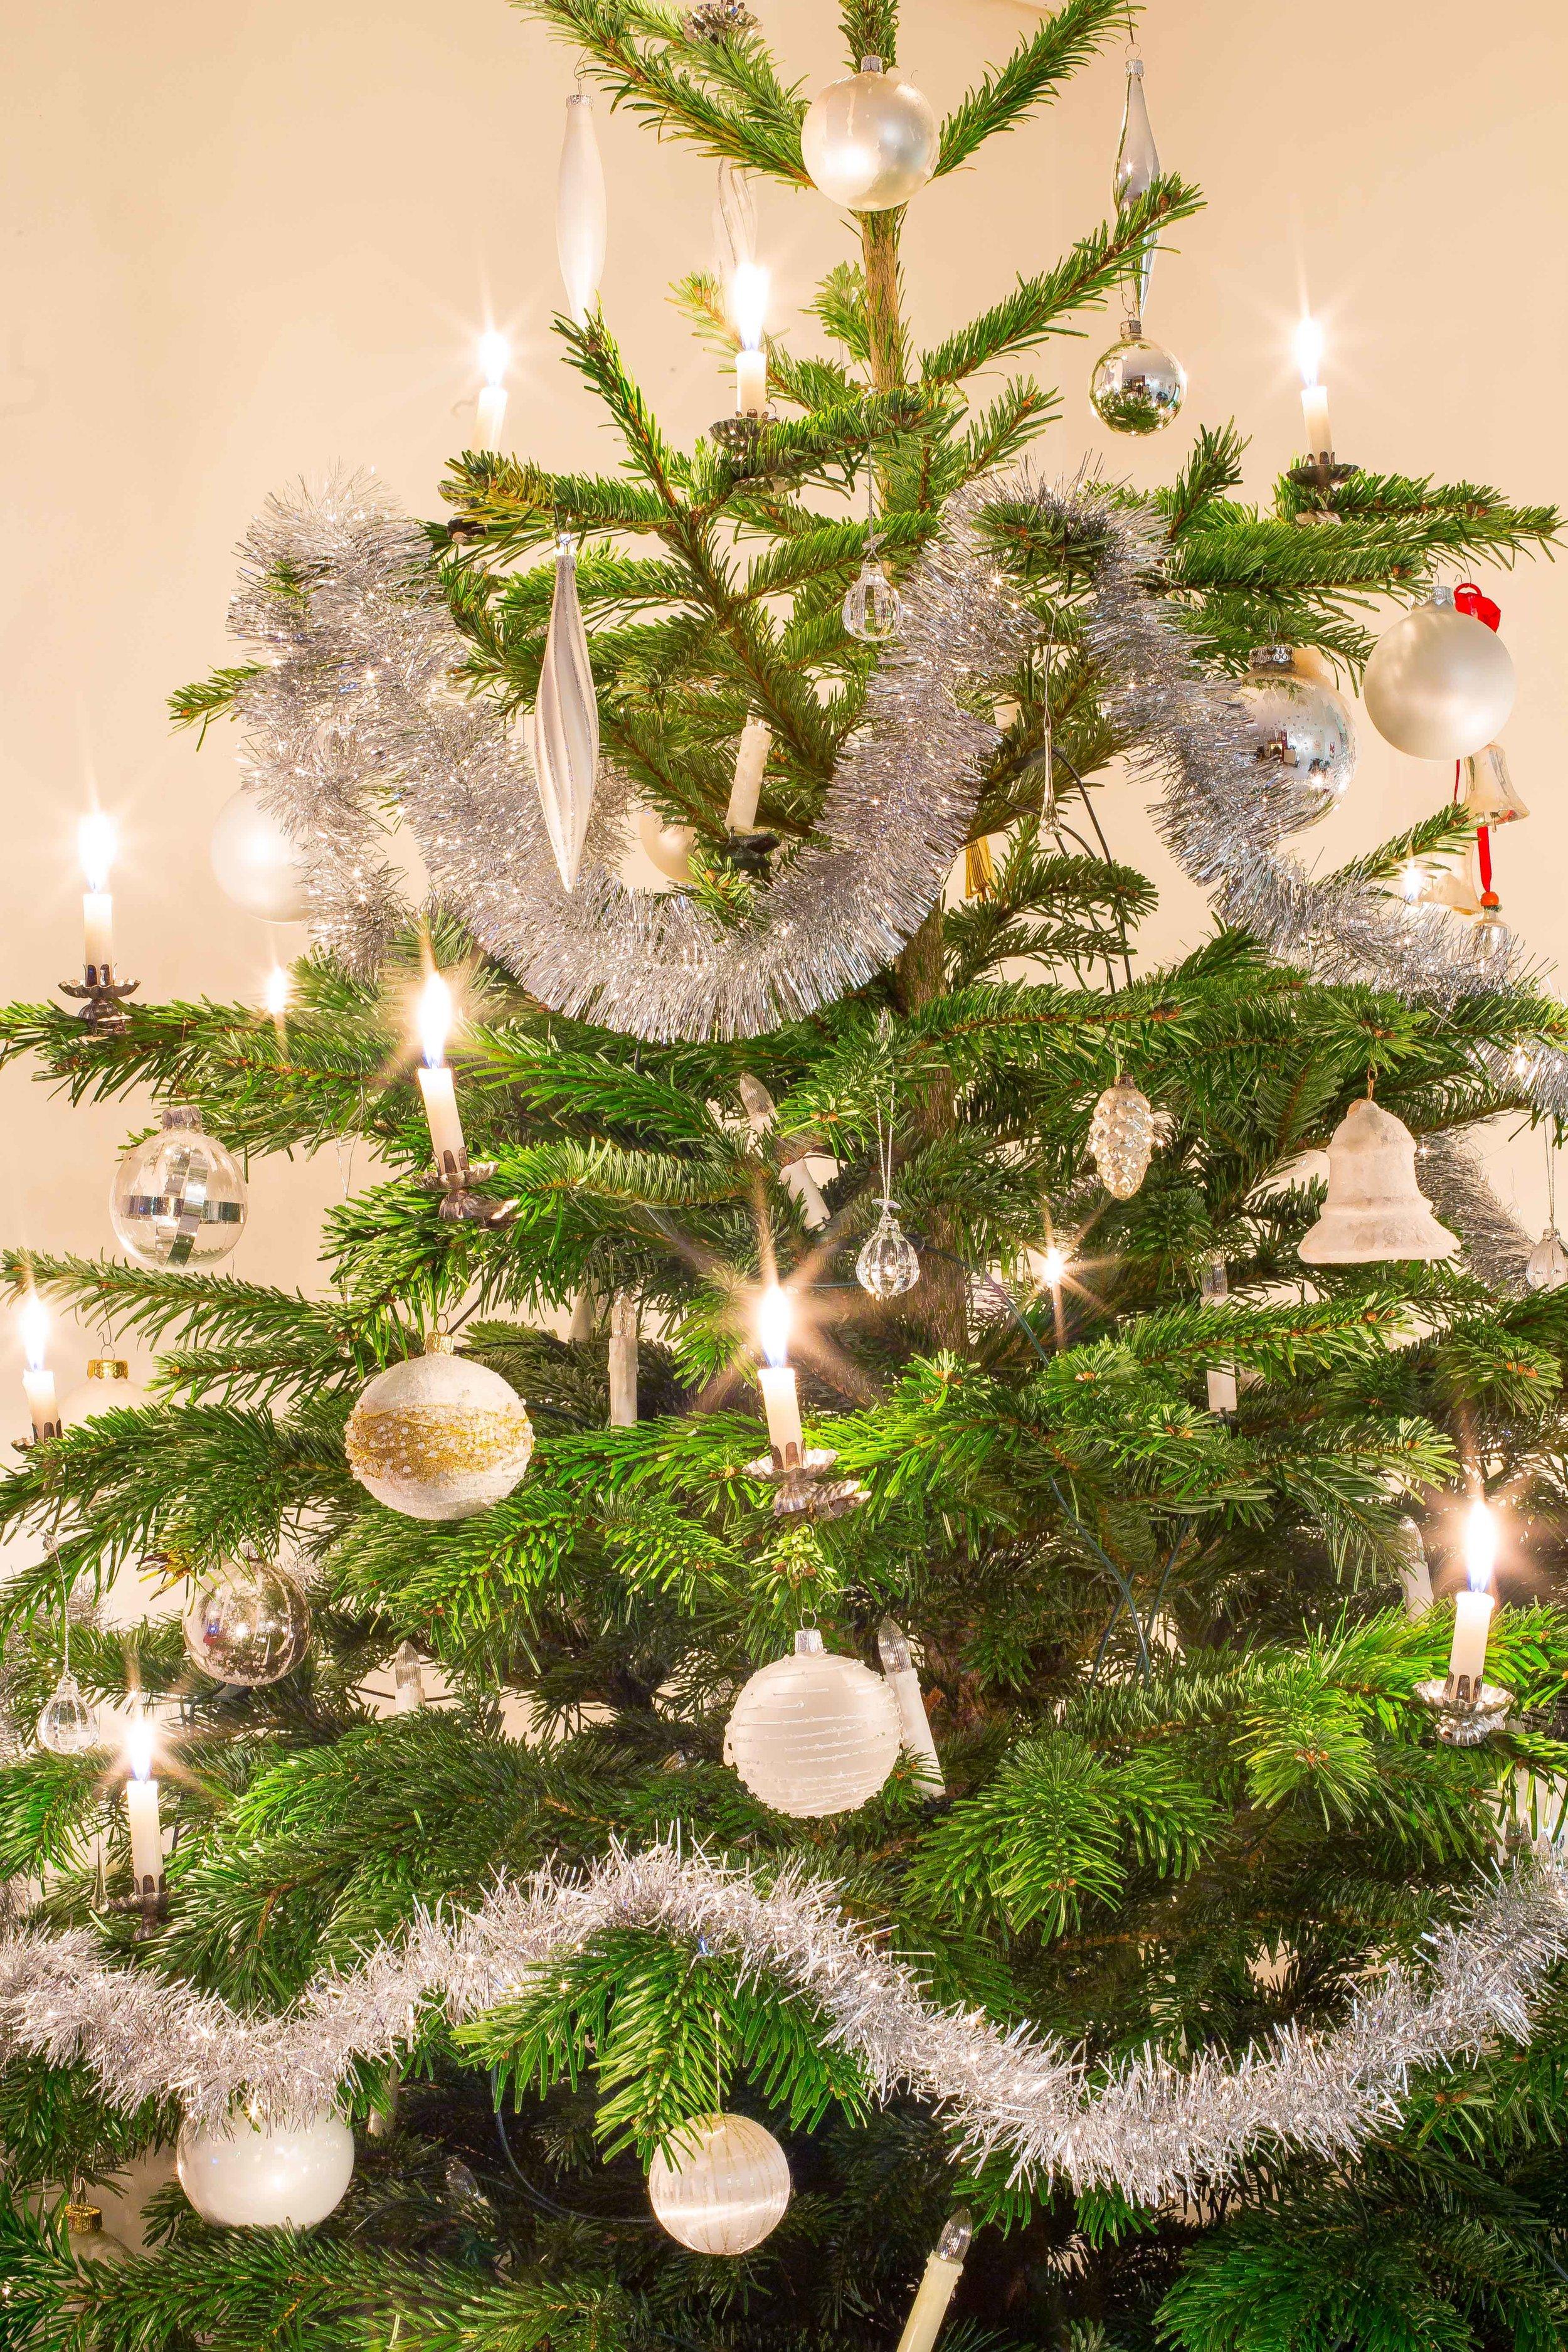 Kerstboom met kaarsjes